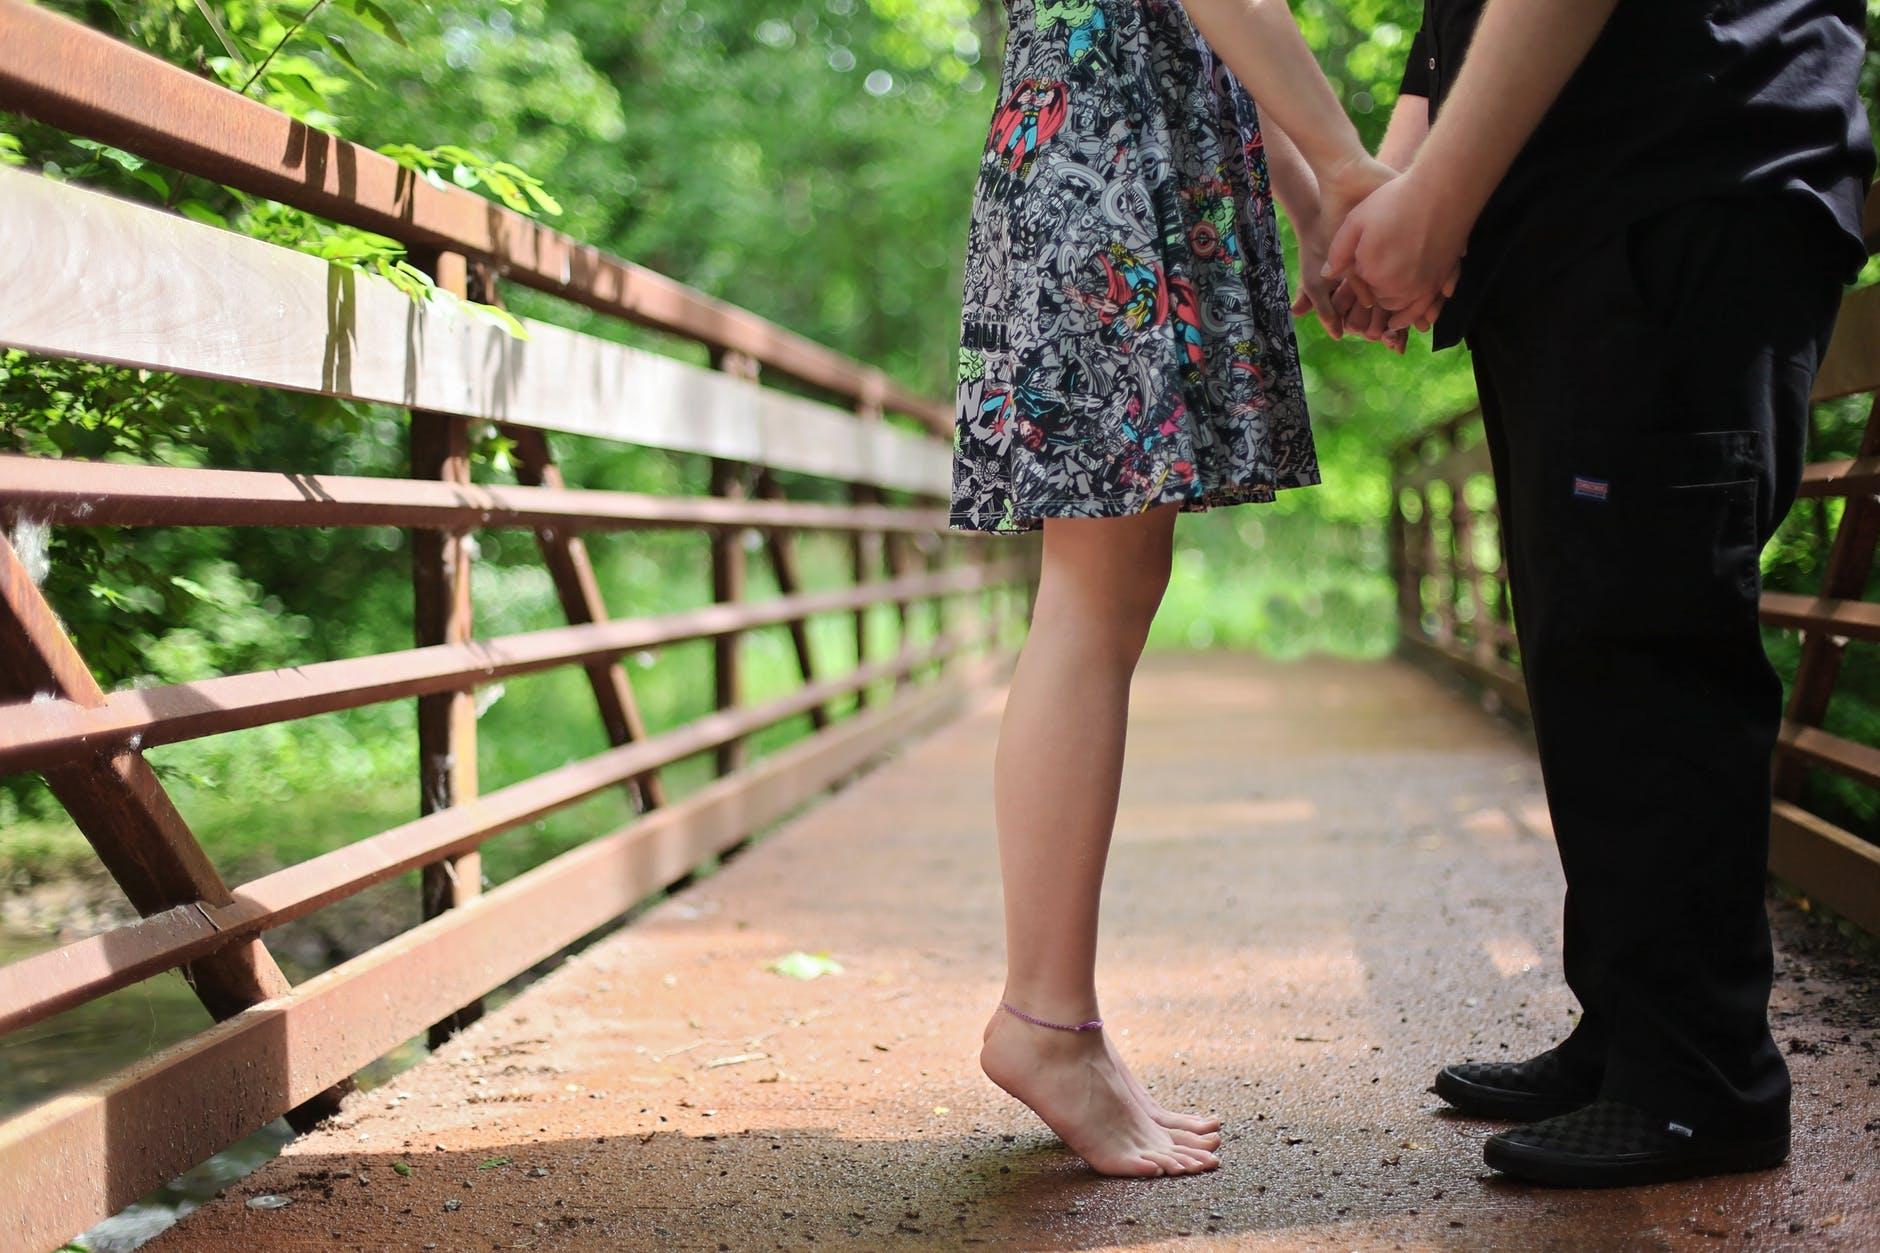 Ini Cinta atau Tergila-gila?